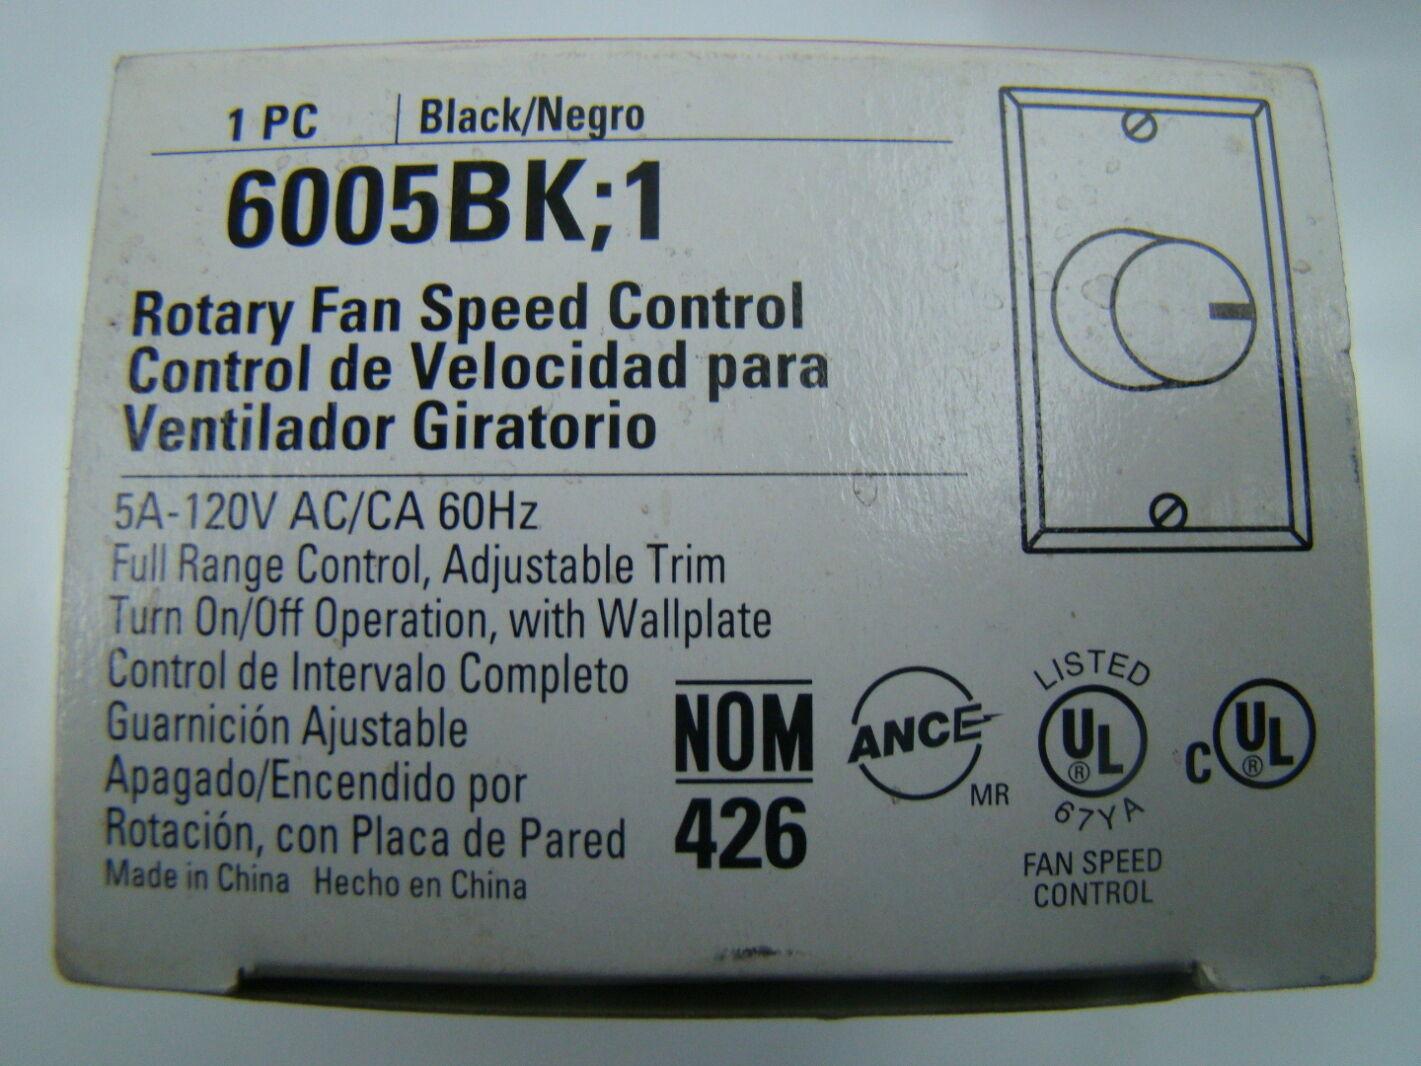 Cooper Wiring Device Pdf Devices Diagrams Single Pole Fan Control 6005bk 1 Ebay Rh Com